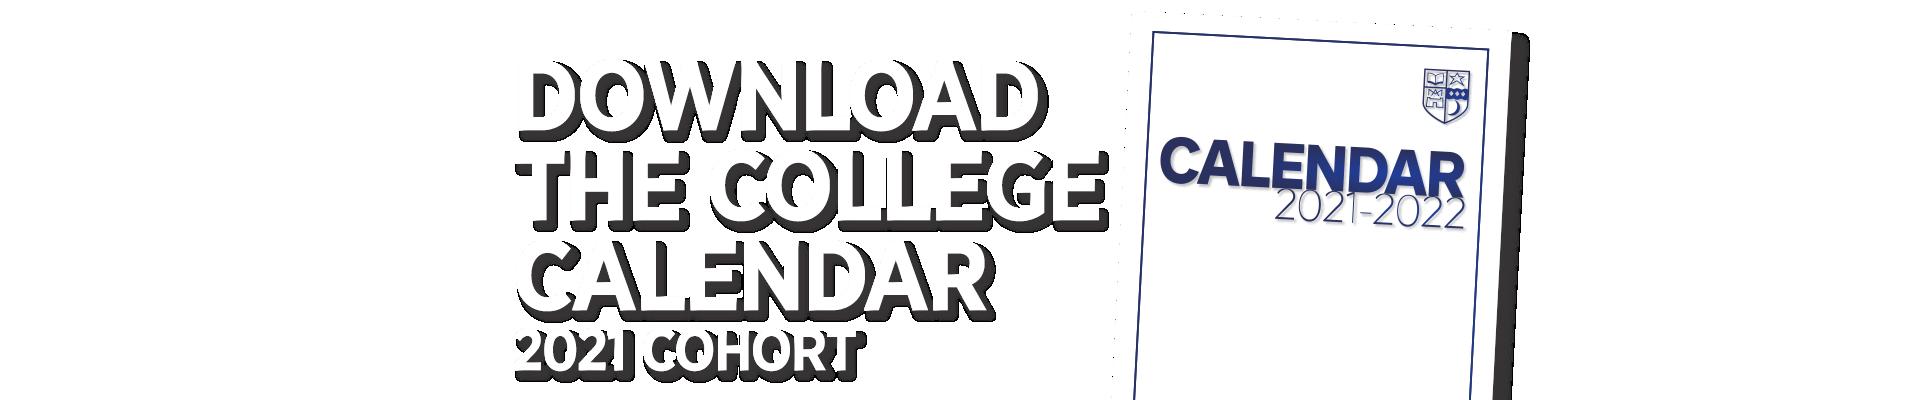 Download the College Calendar